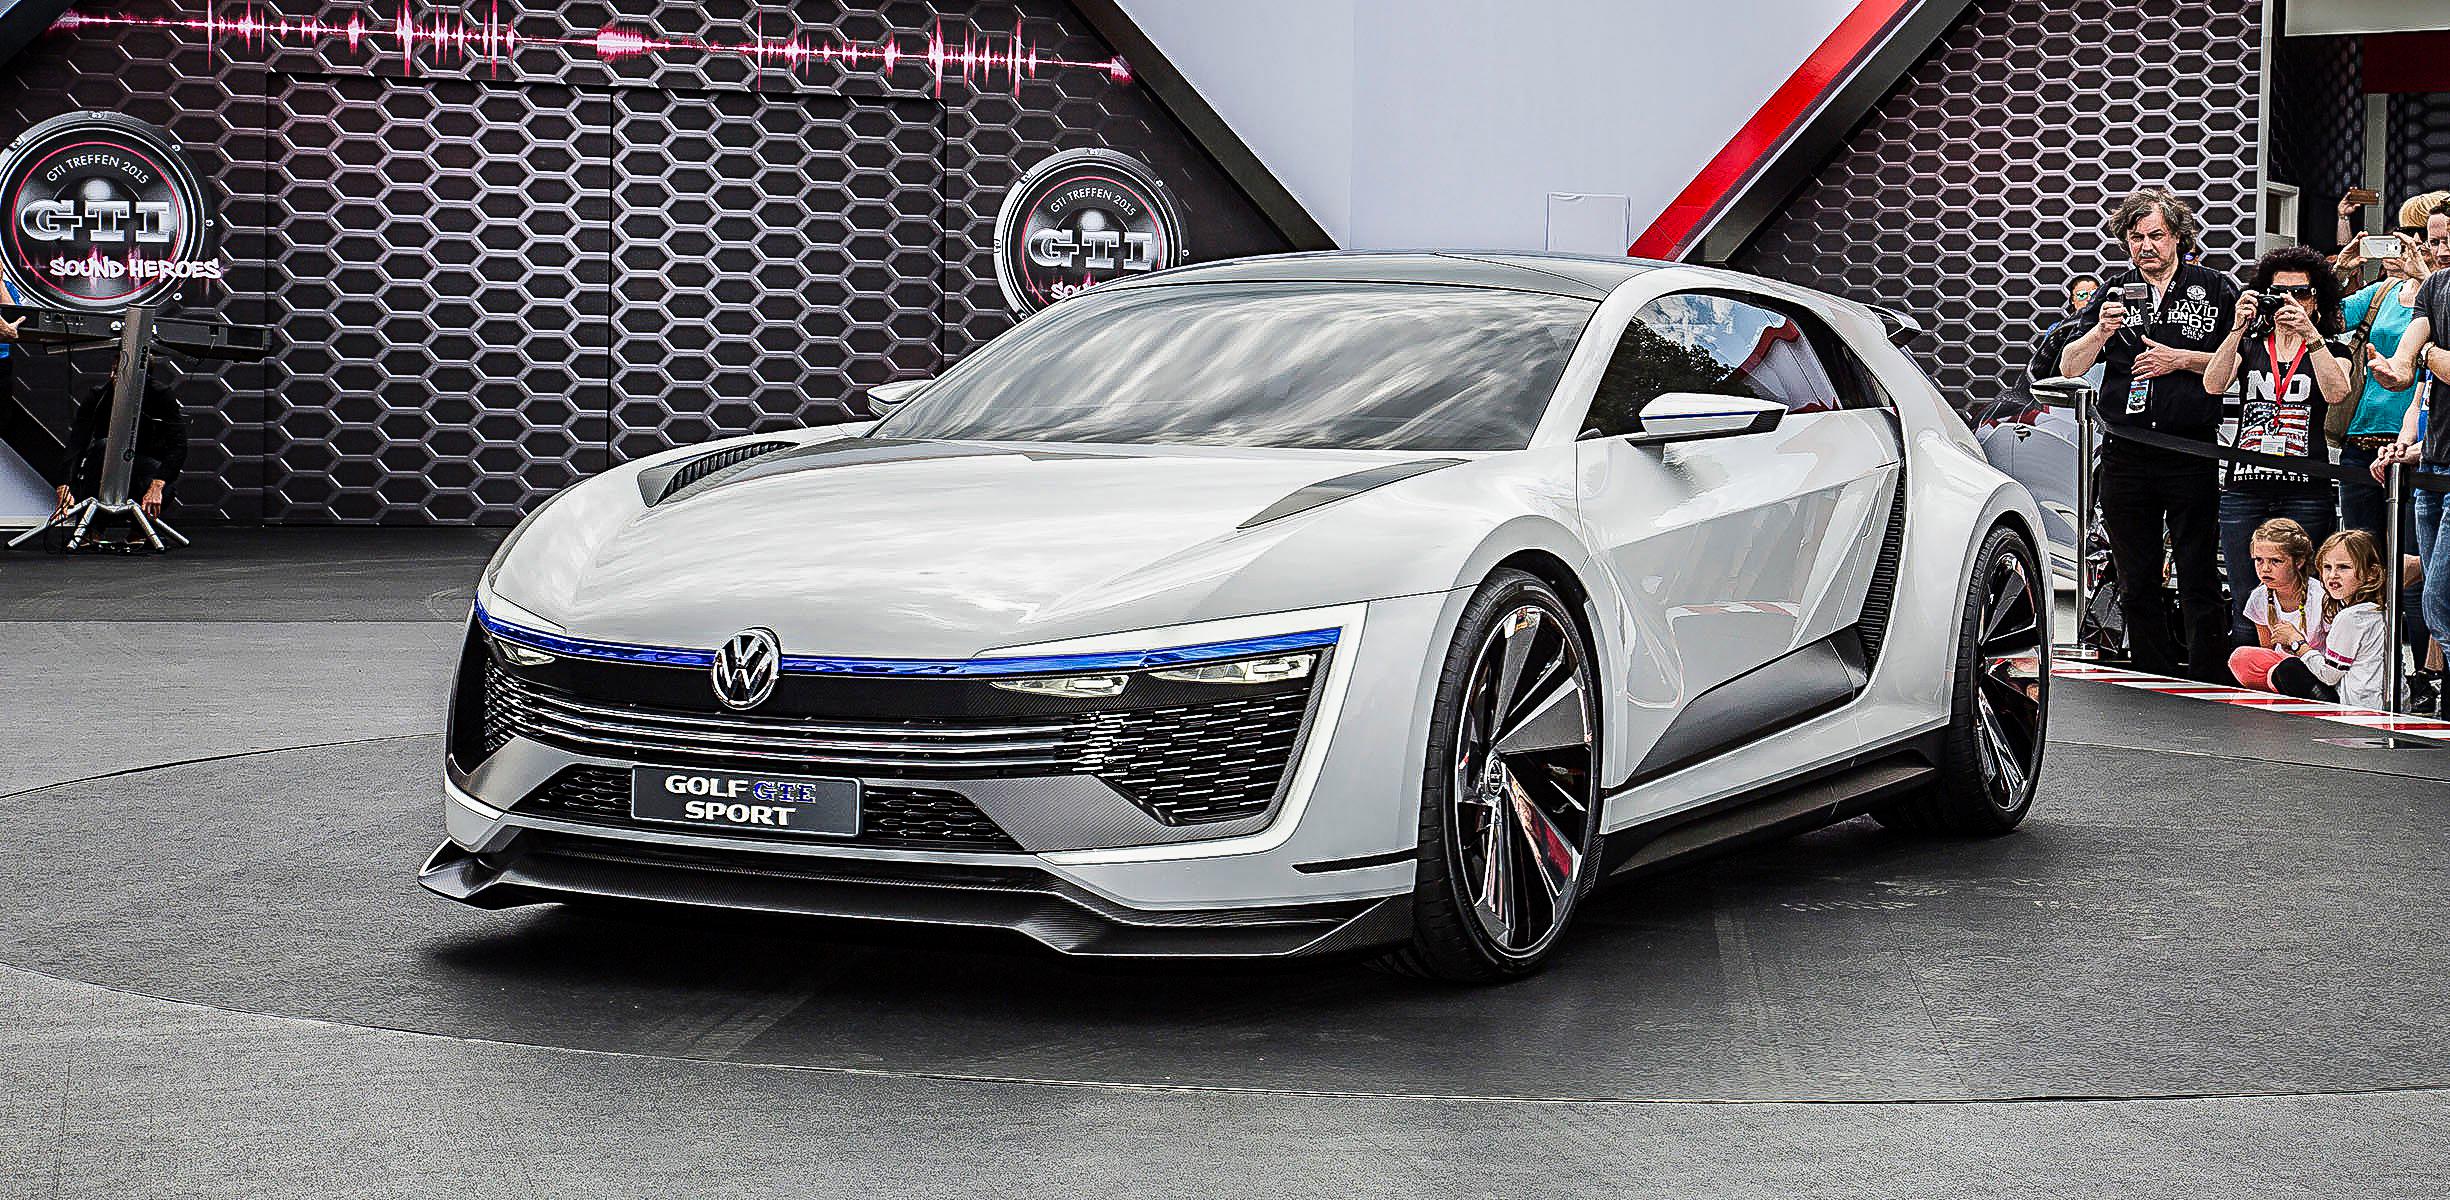 Alu kola Volkswagen Golf Gte